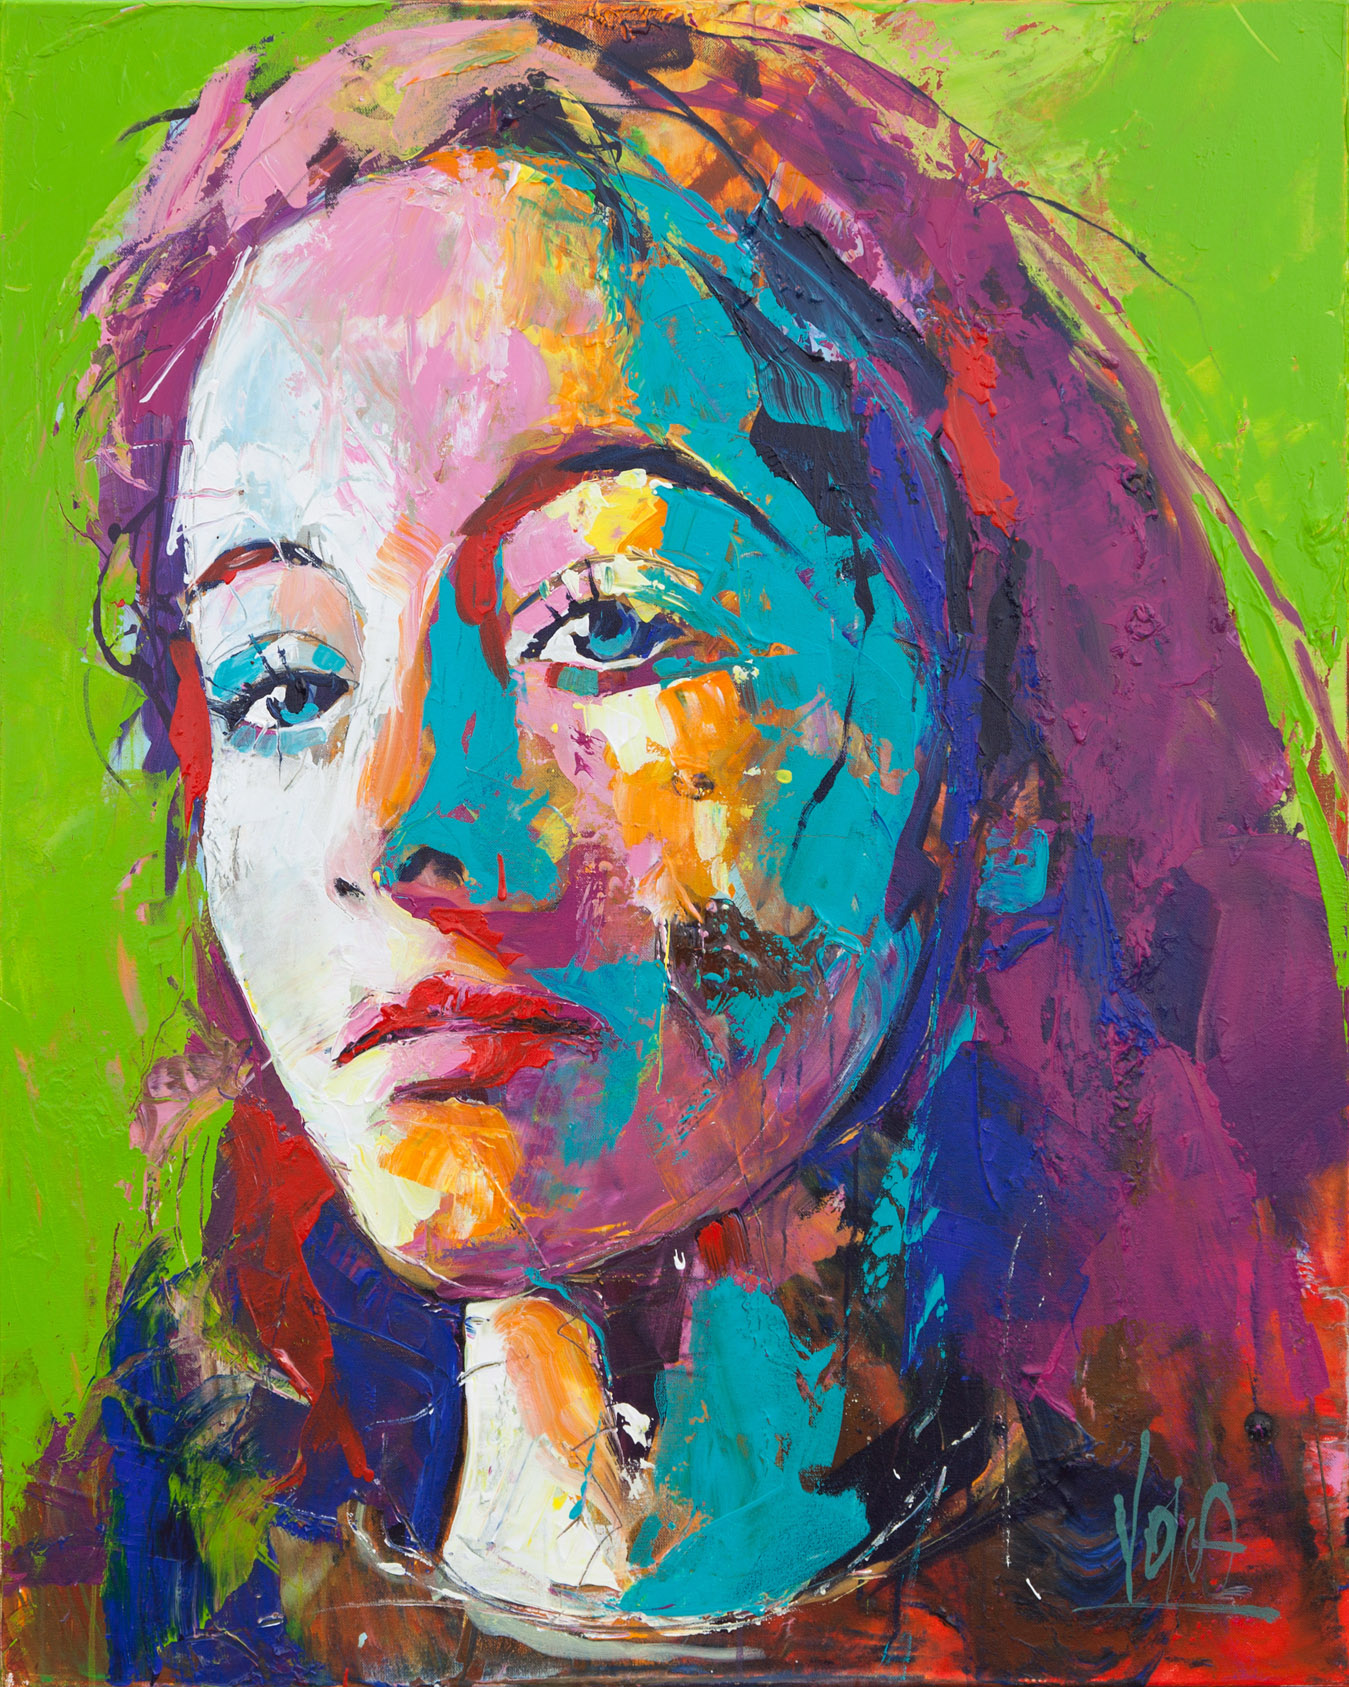 Head, 80x100 cm/31,5x39,4 inch, Acrylic on Canvas